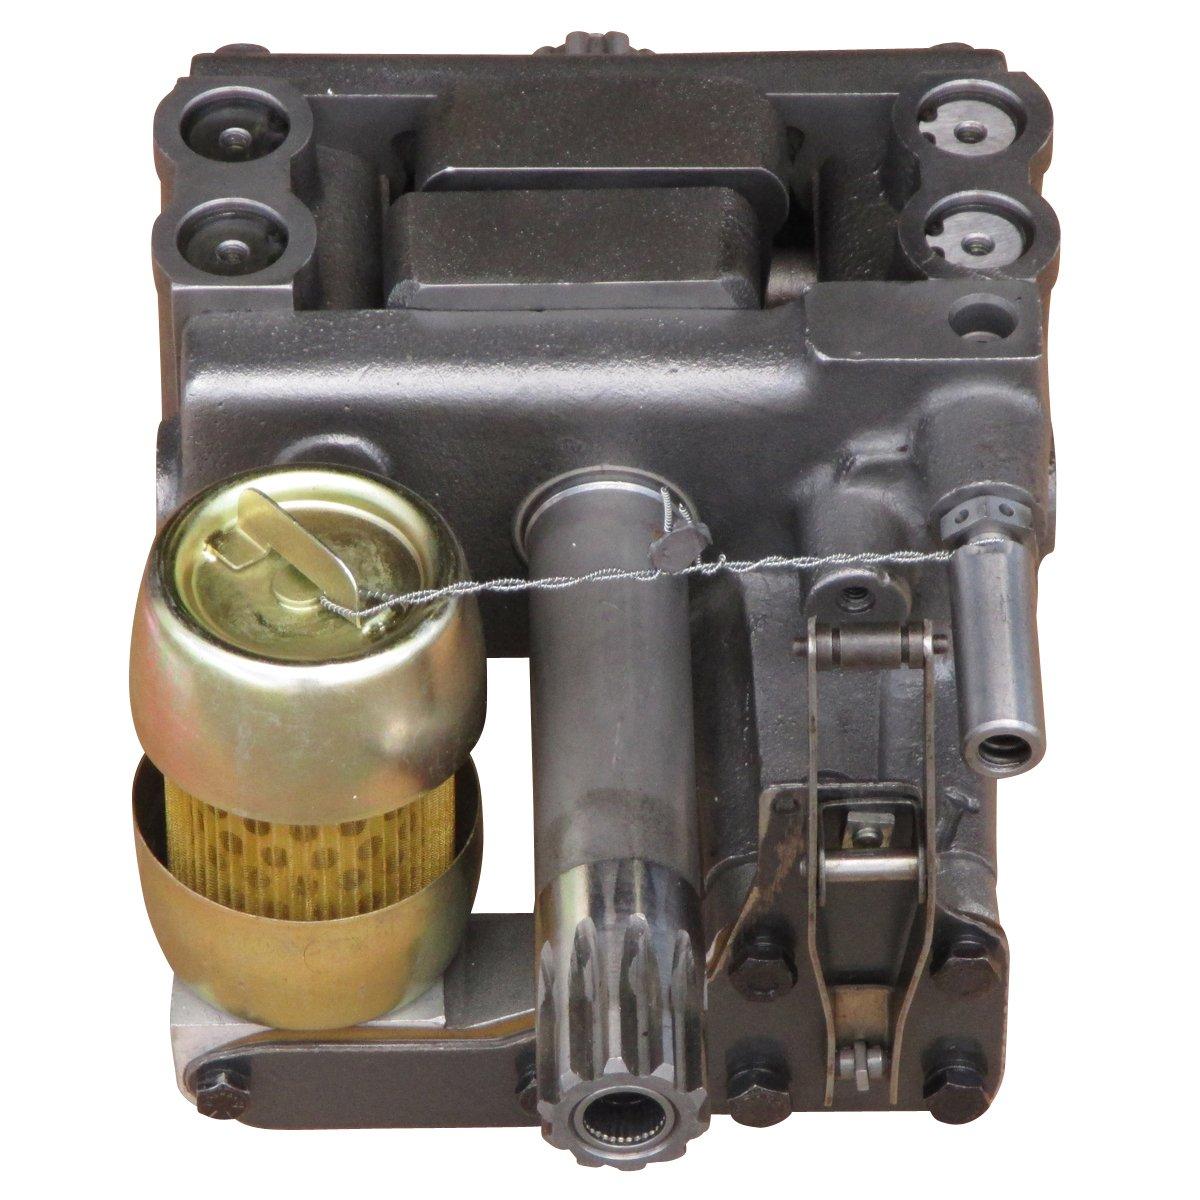 Hamiltonbobs Premium Quality Hydraulic Lift Pump Massey Ferguson MF... by HamiltonBobs